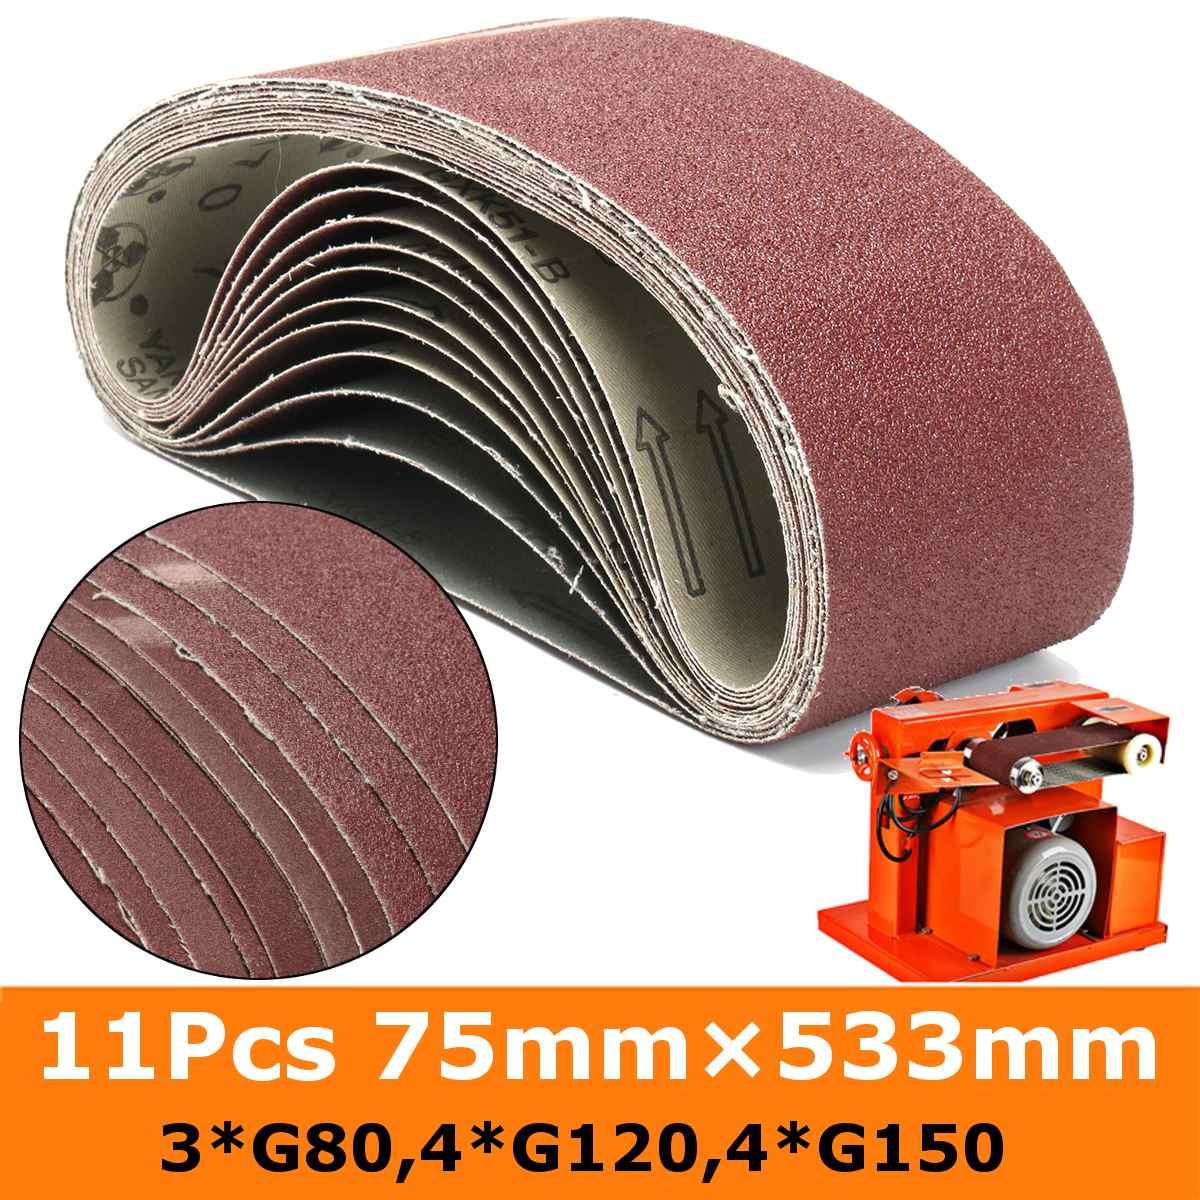 11Pcs Sanding Belts 75mm X 533mm 80 120 150 Mixed Grit Alumina Sander File Belt Set Abrasive Tools Accessories